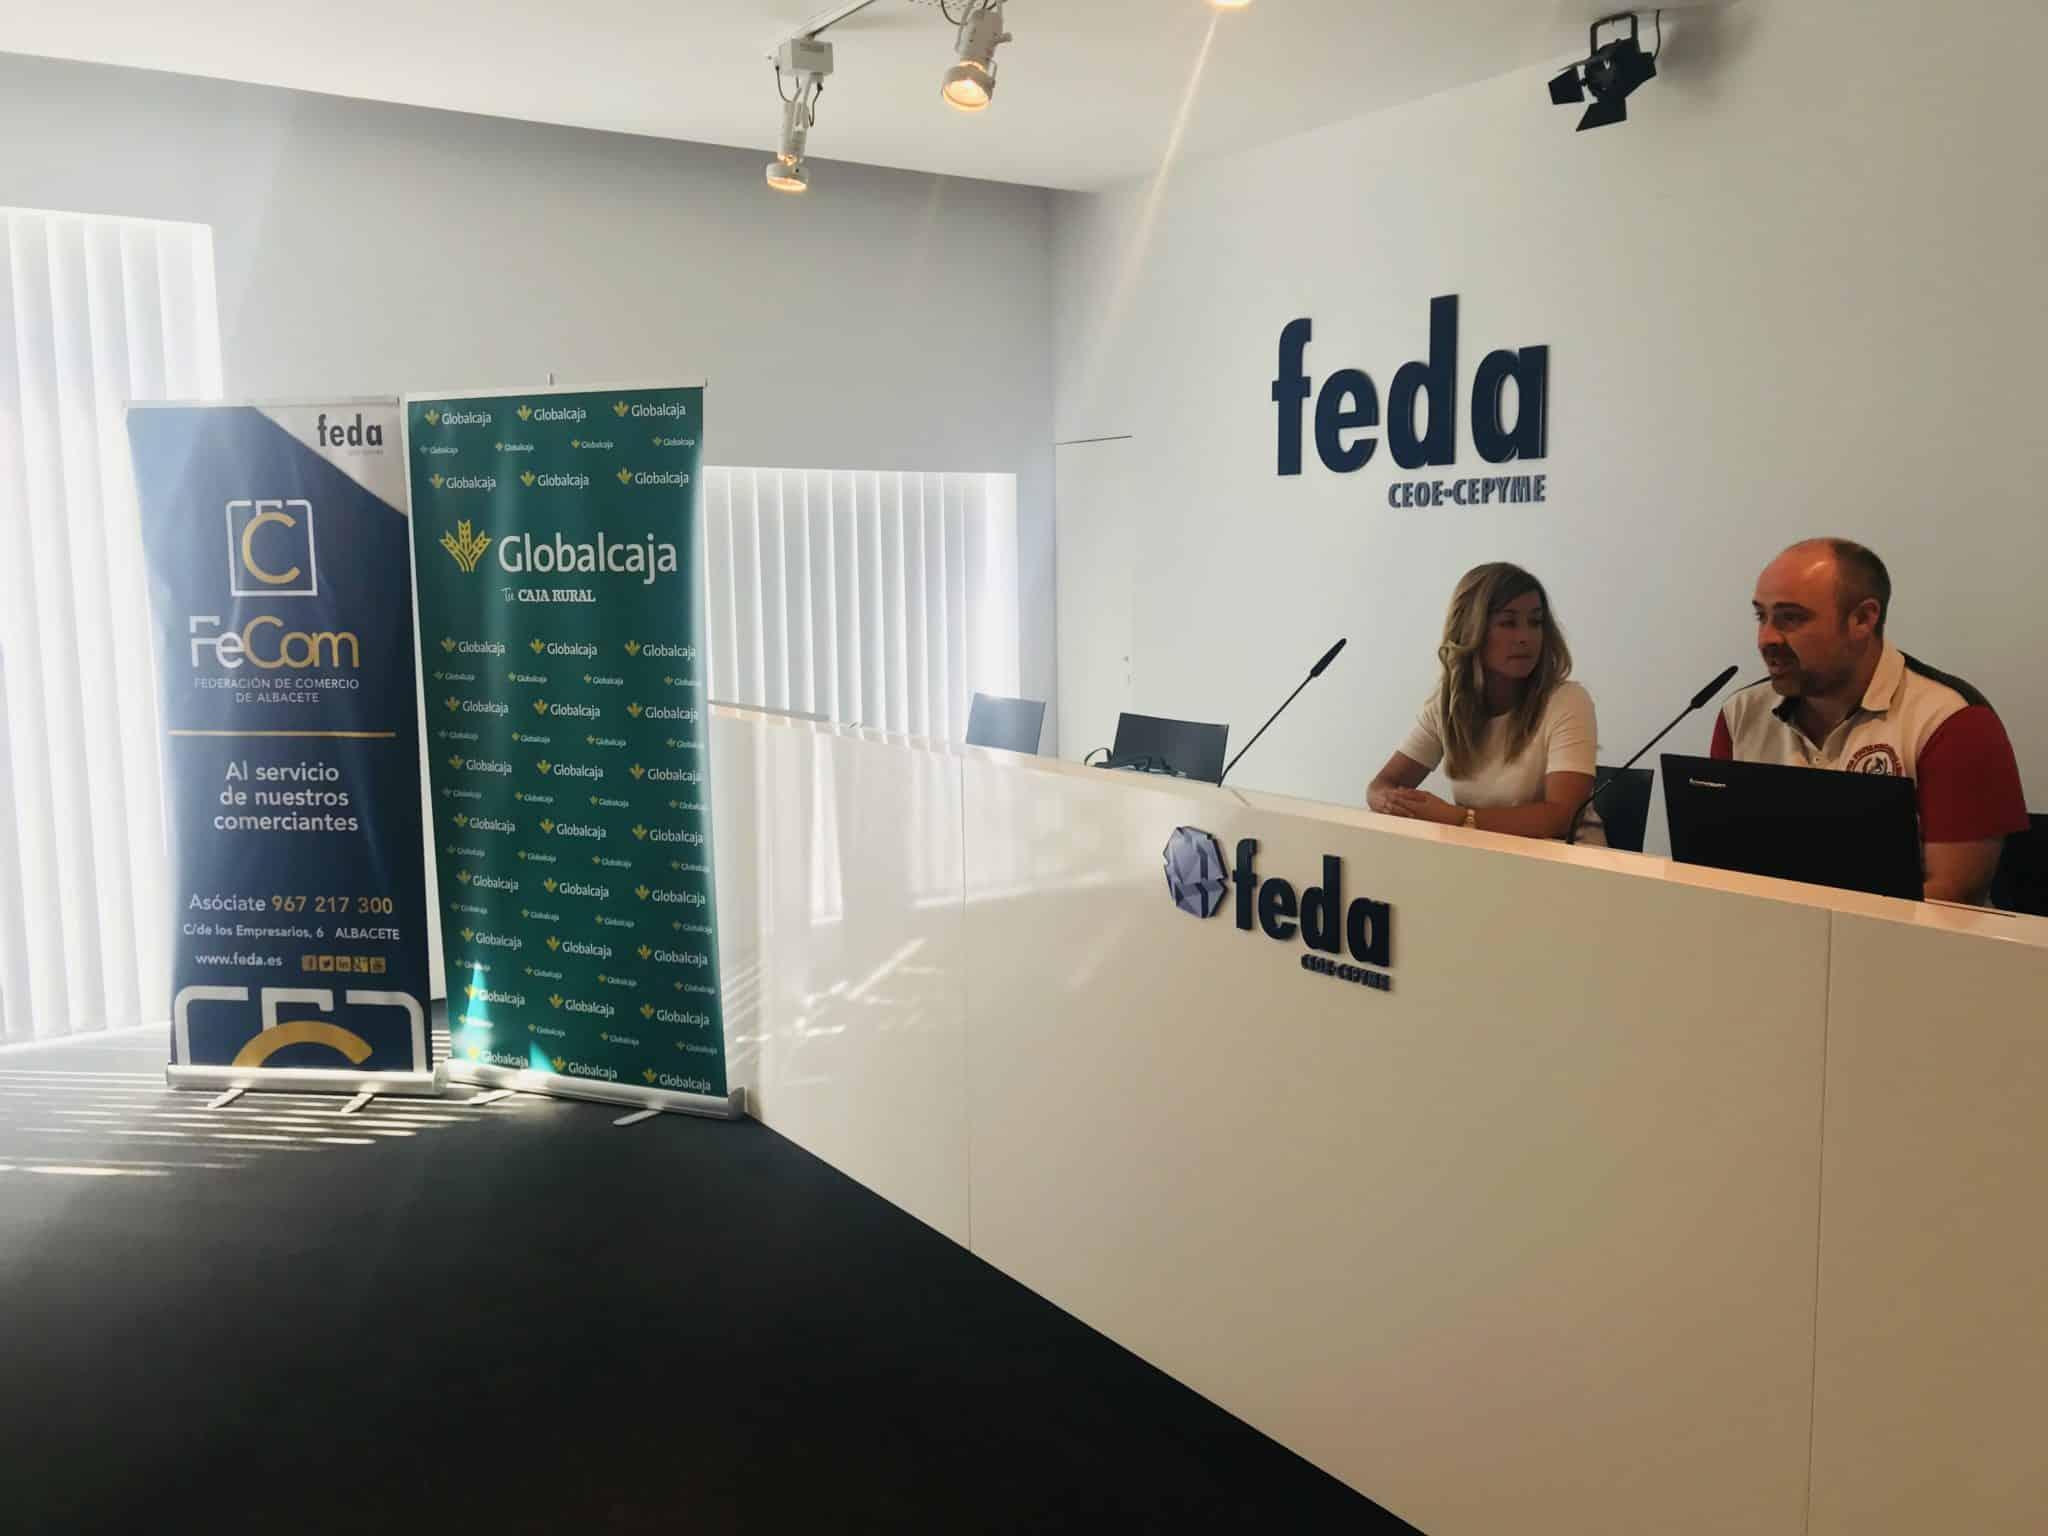 https://blog.globalcaja.es/wp-content/uploads/2018/07/Tajerta-regalo-FECOM-Globalcaja-6.jpg